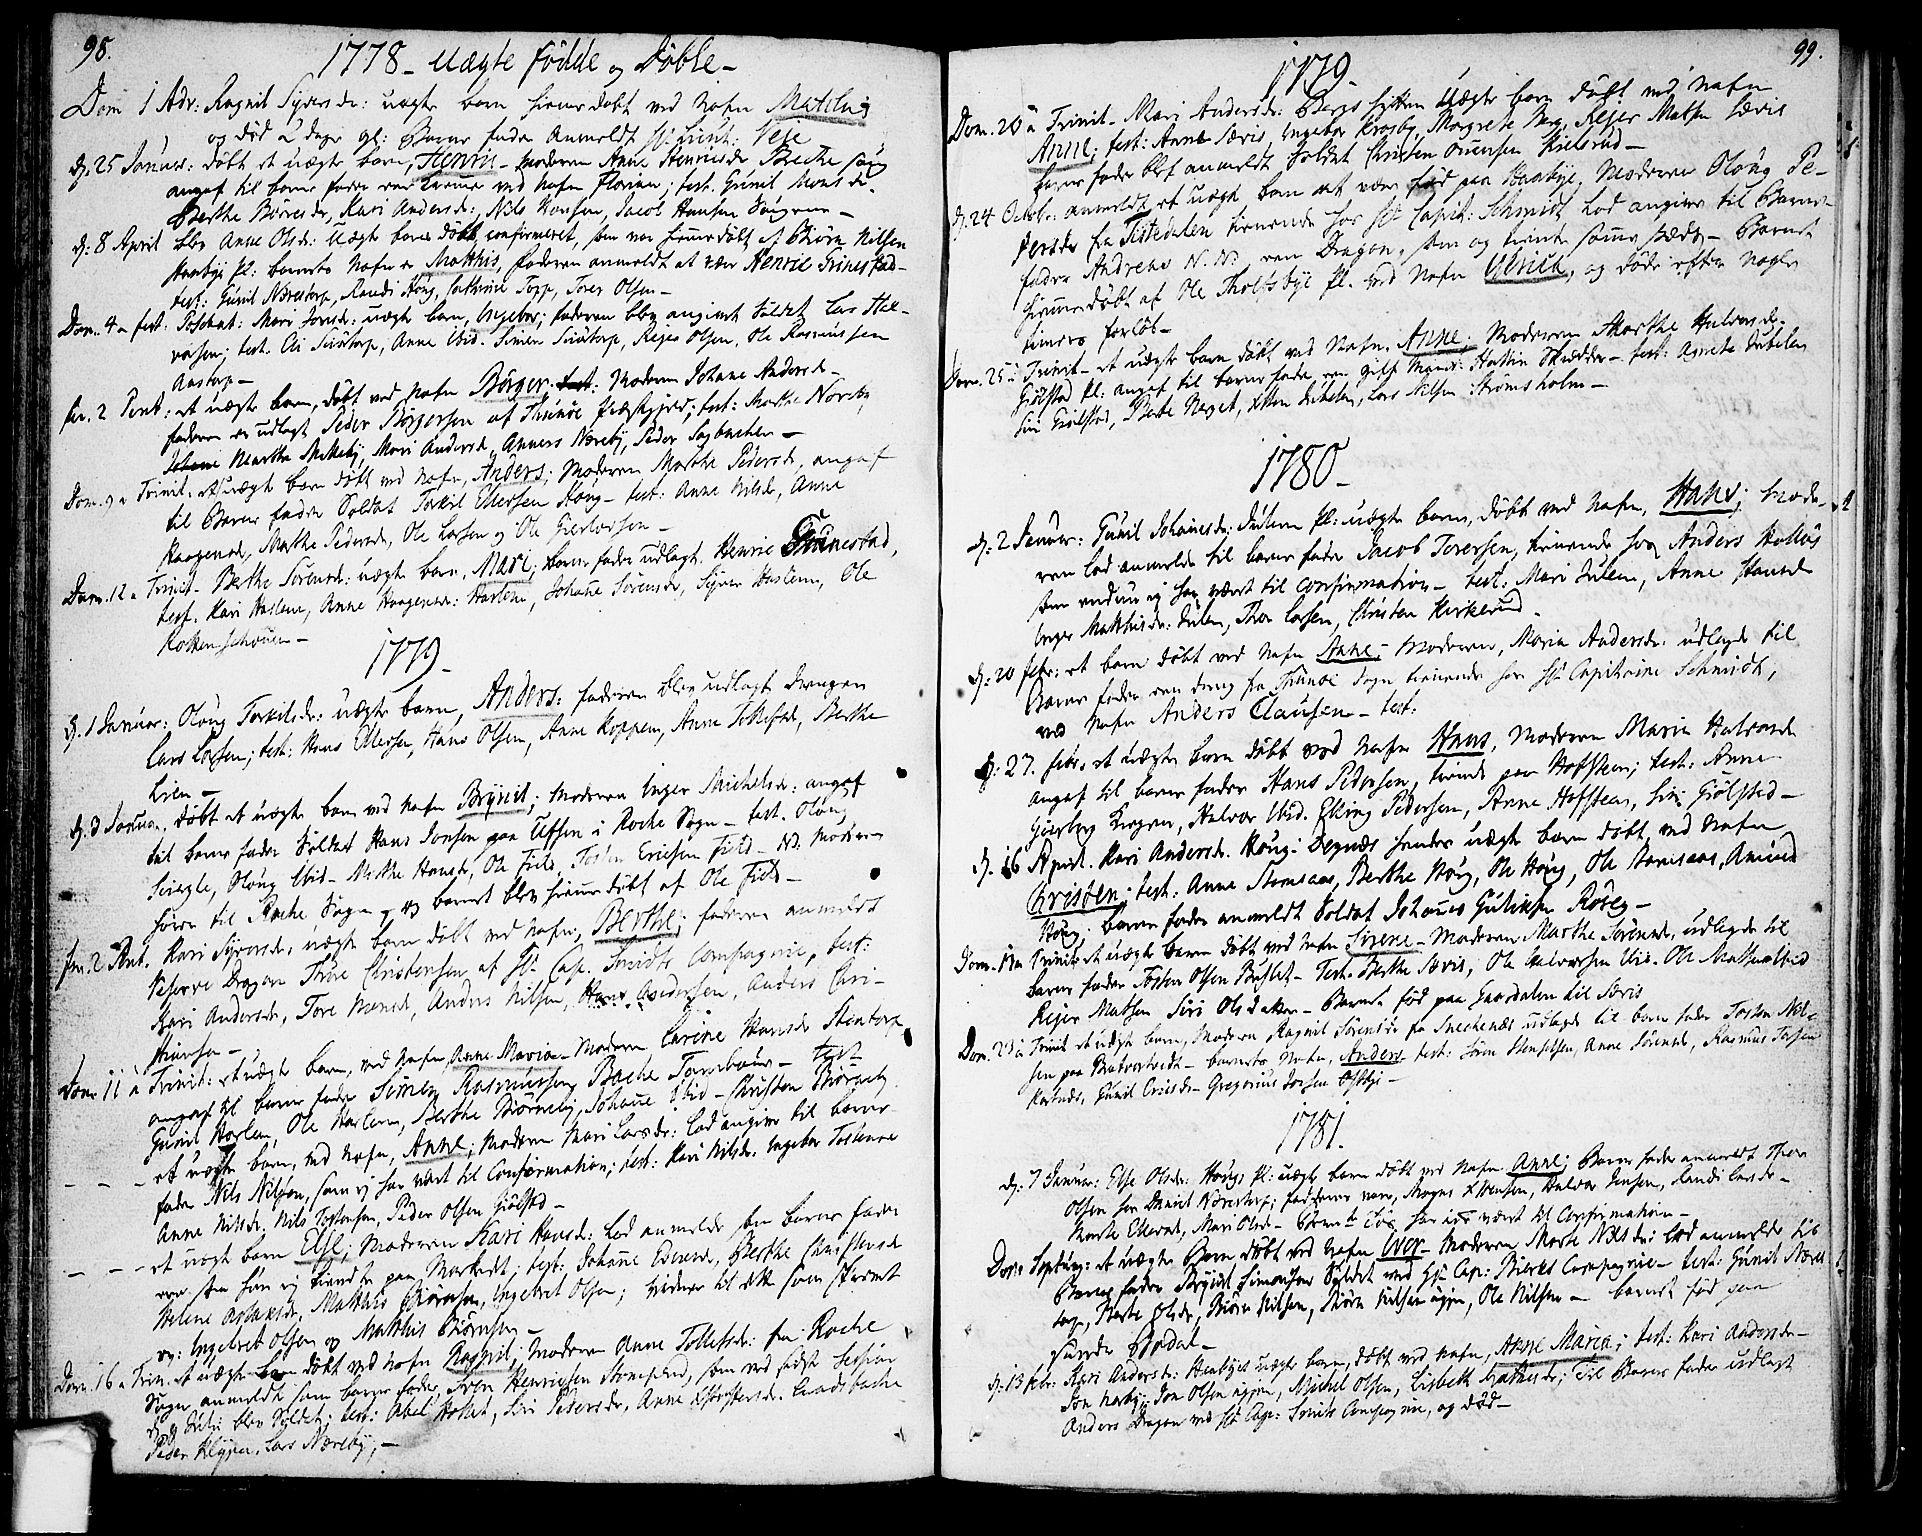 SAO, Rakkestad prestekontor Kirkebøker, F/Fa/L0004: Ministerialbok nr. I 4, 1777-1783, s. 98-99